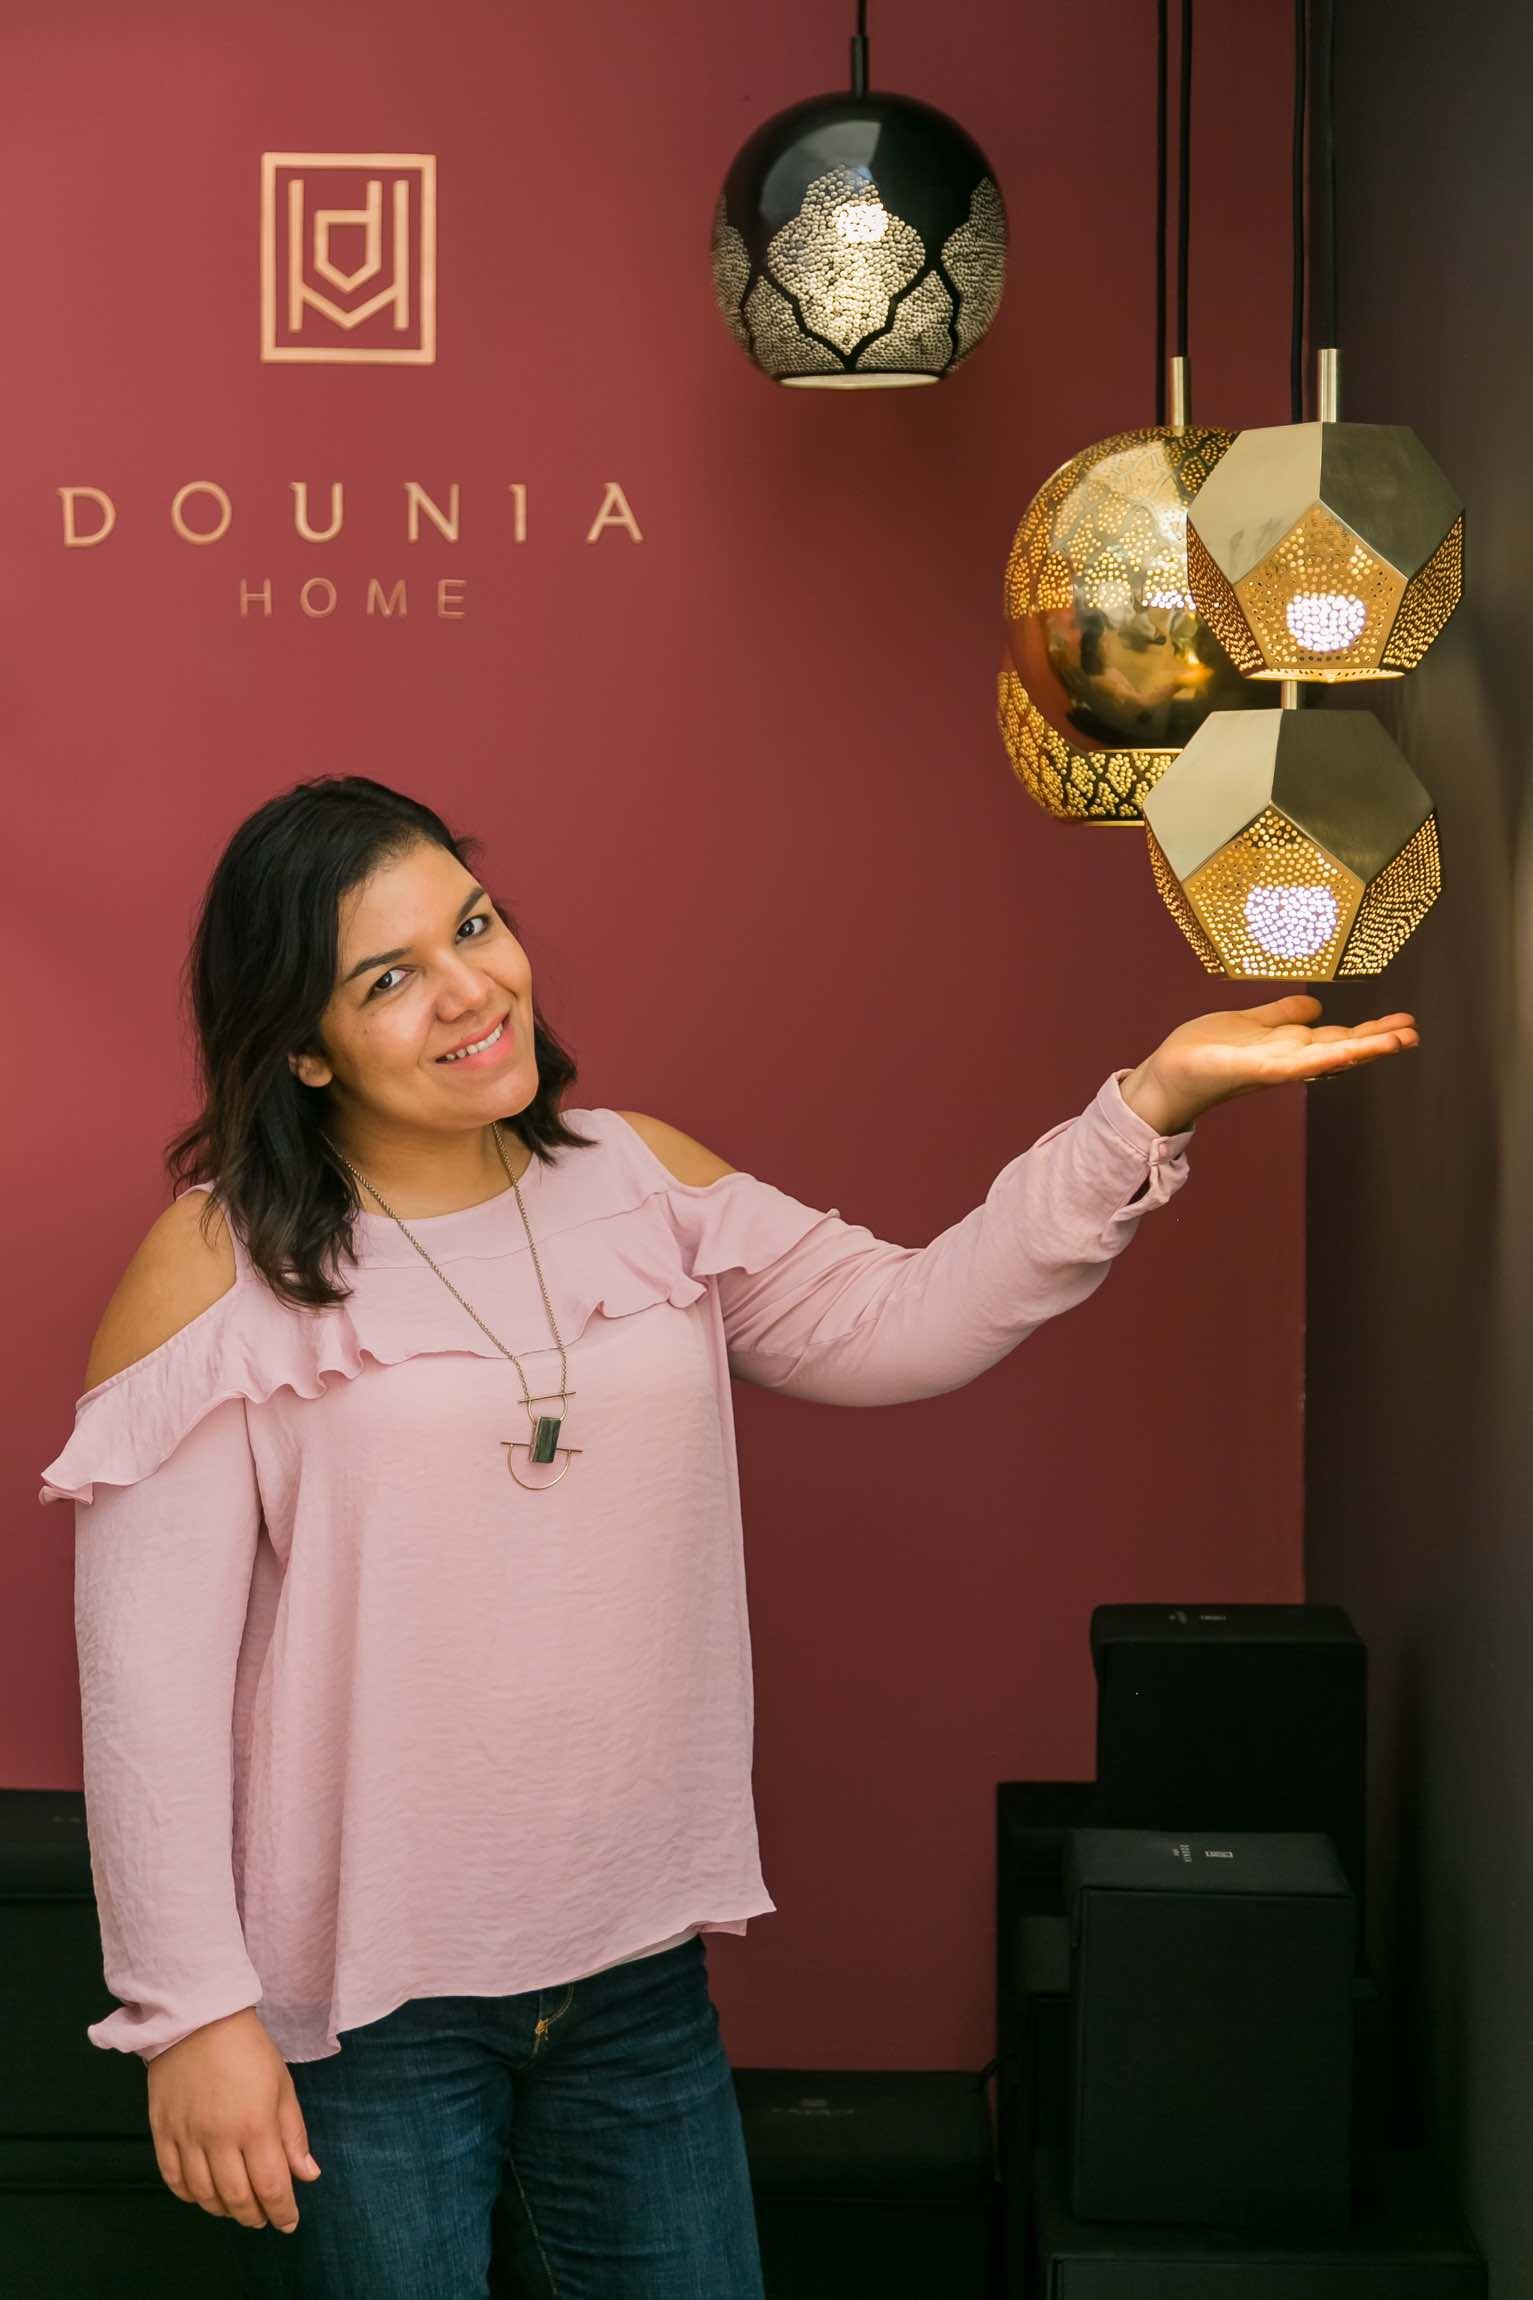 Dounia exhibit.jpg